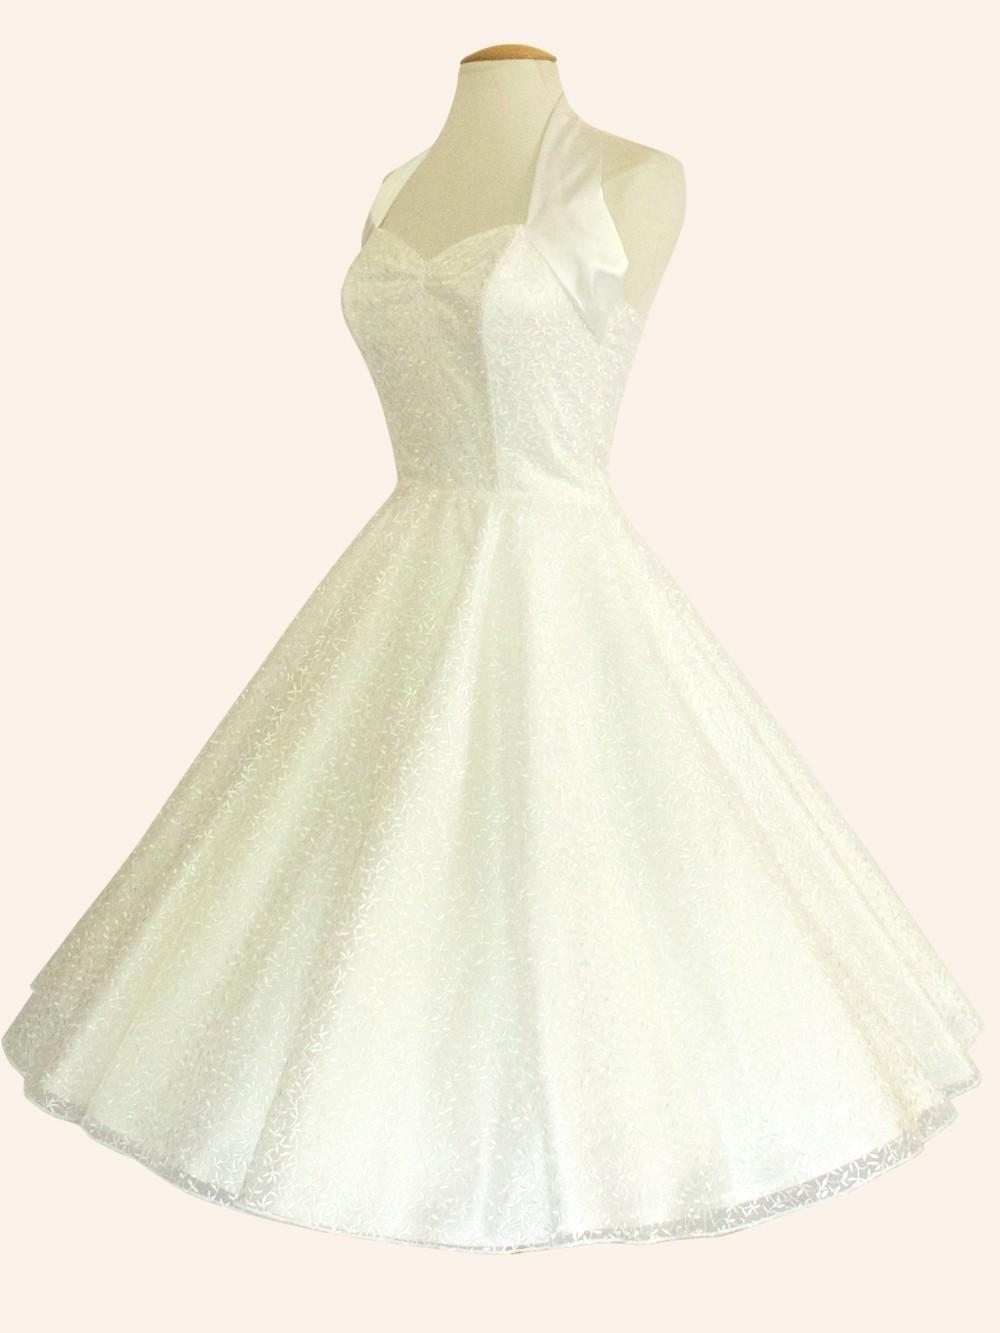 A la recheche de ma robe de mariée